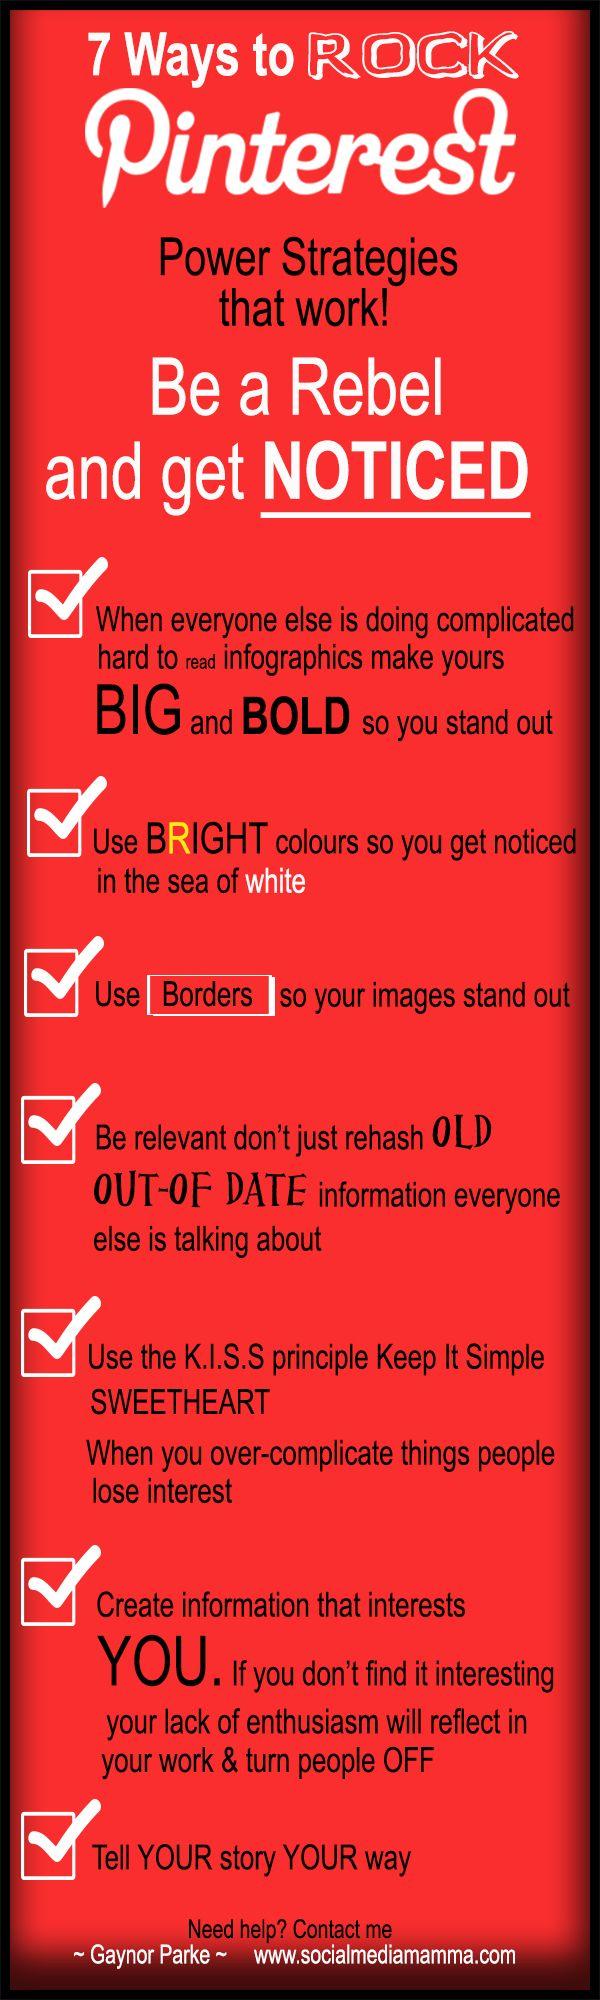 7 Pinterest for business power strategies that get you noticed Gaynor Parke wwww.socialmediamamma.com Infographic